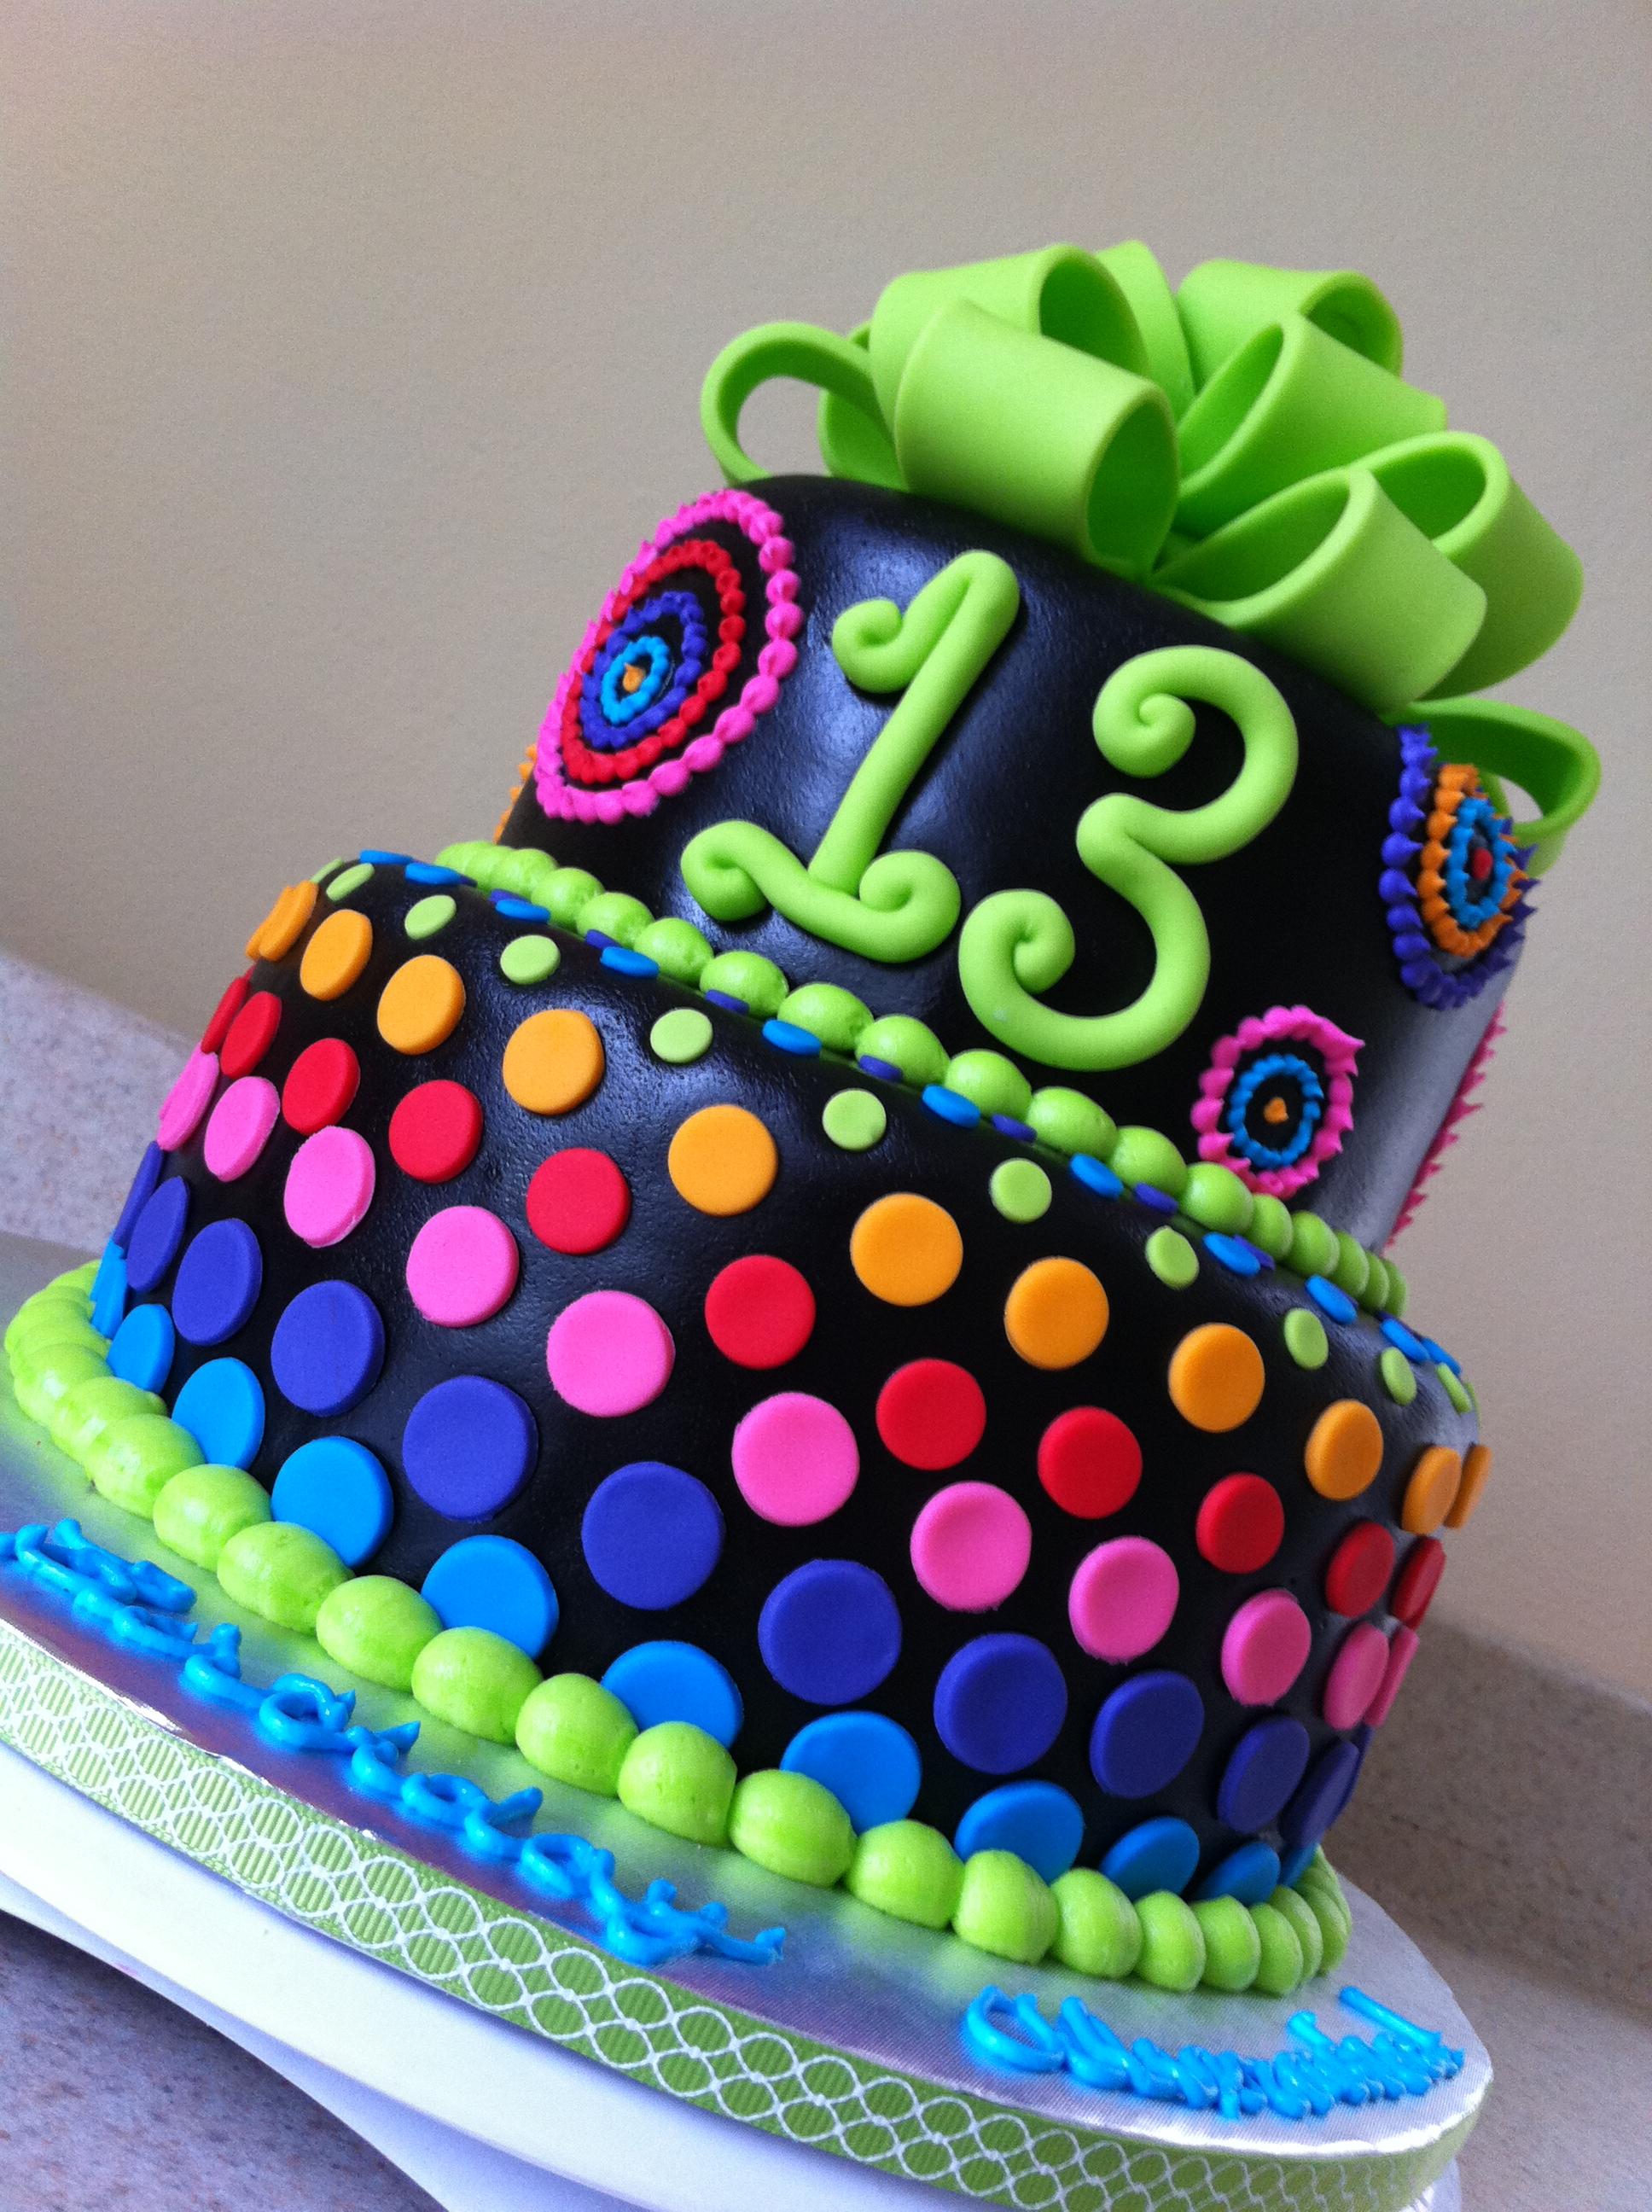 Psychadelic Rainbow Birthday Cake Lolo S Cakes Amp Sweets